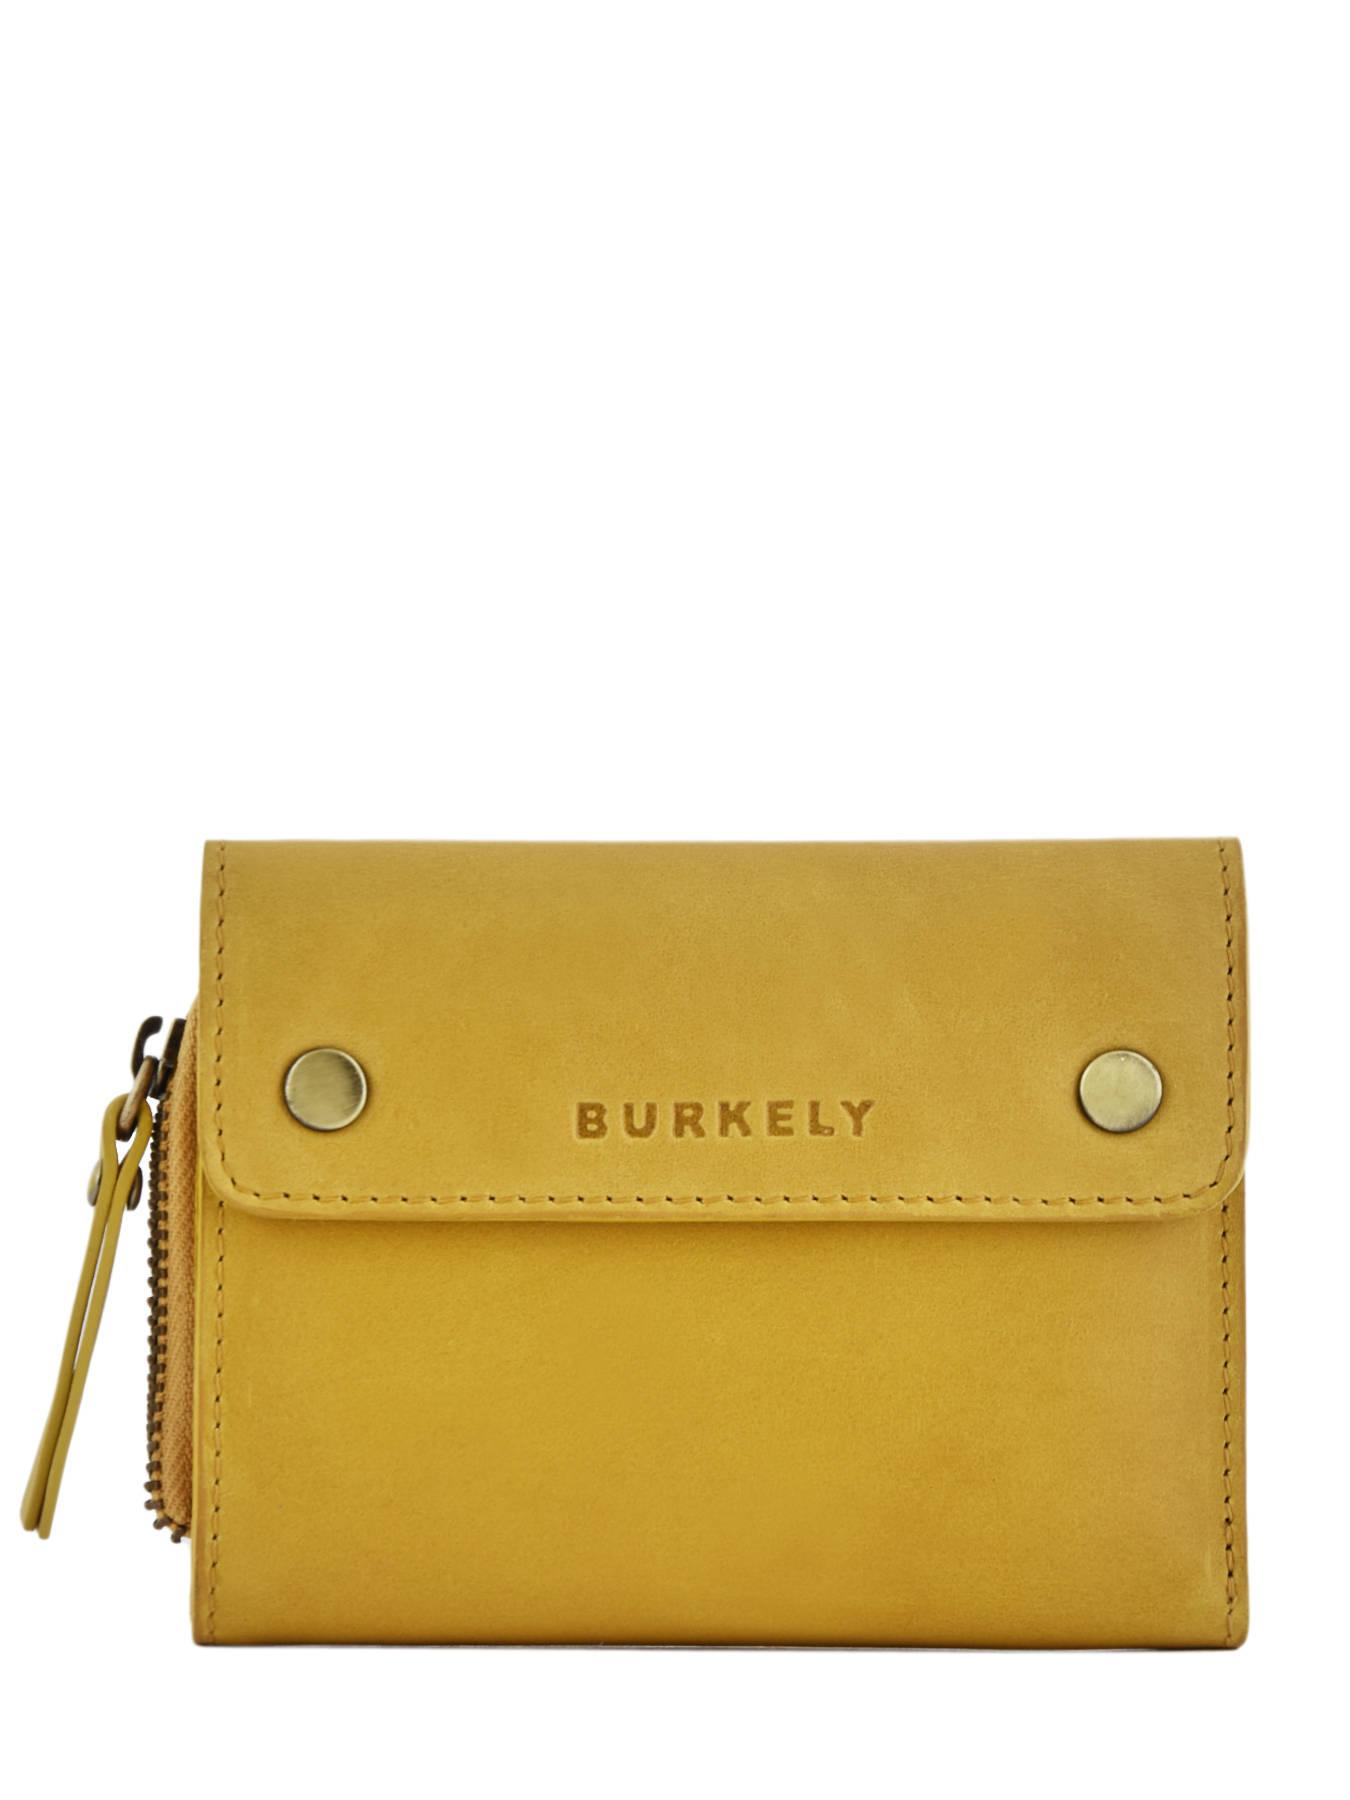 1d3e866de83 ... Portefeuille Leder Burkely Geel desert daisy 840783 ...